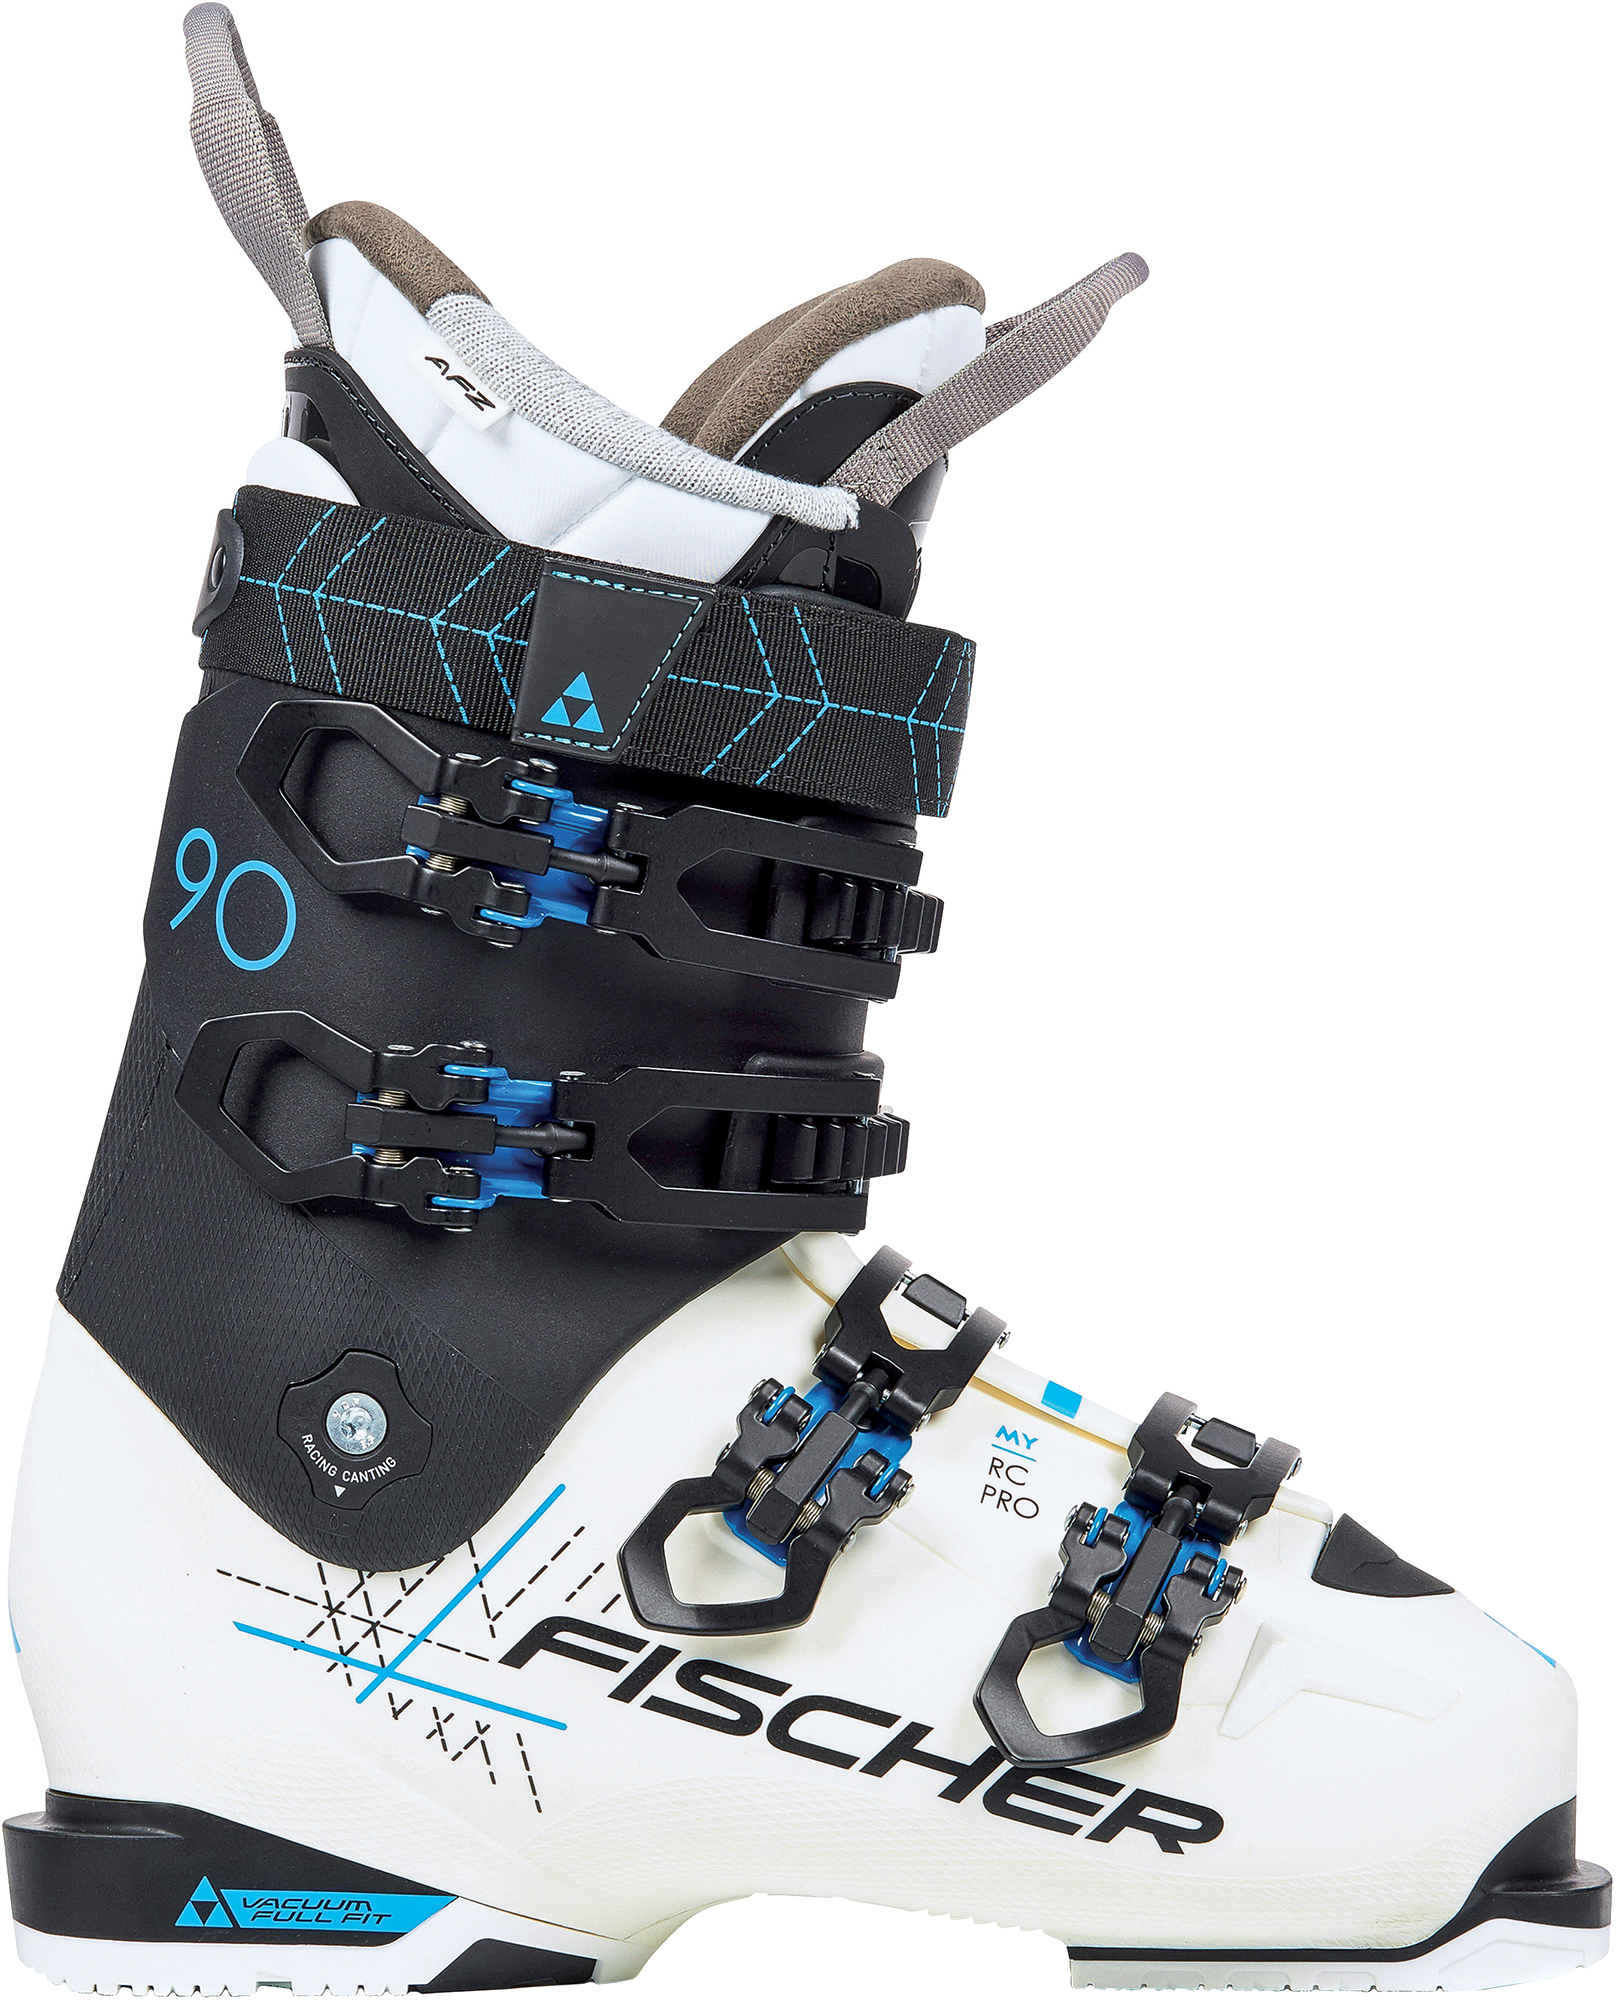 Fischer Ботинки горнолыжные женские My Rc Pro 90 Vacuum Full Fit, размер 41